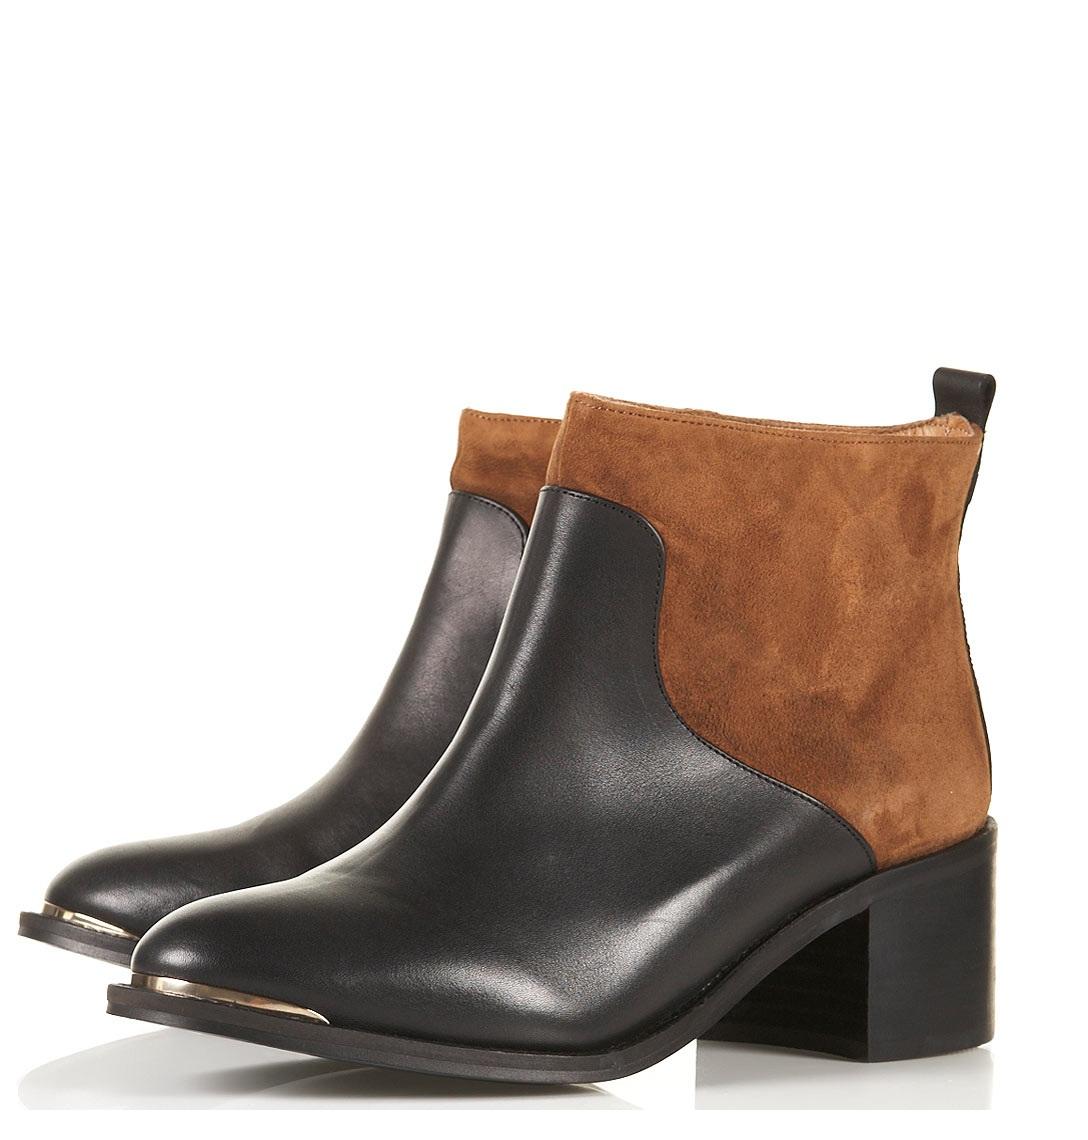 Ugg Boots In Dfo Melbourne